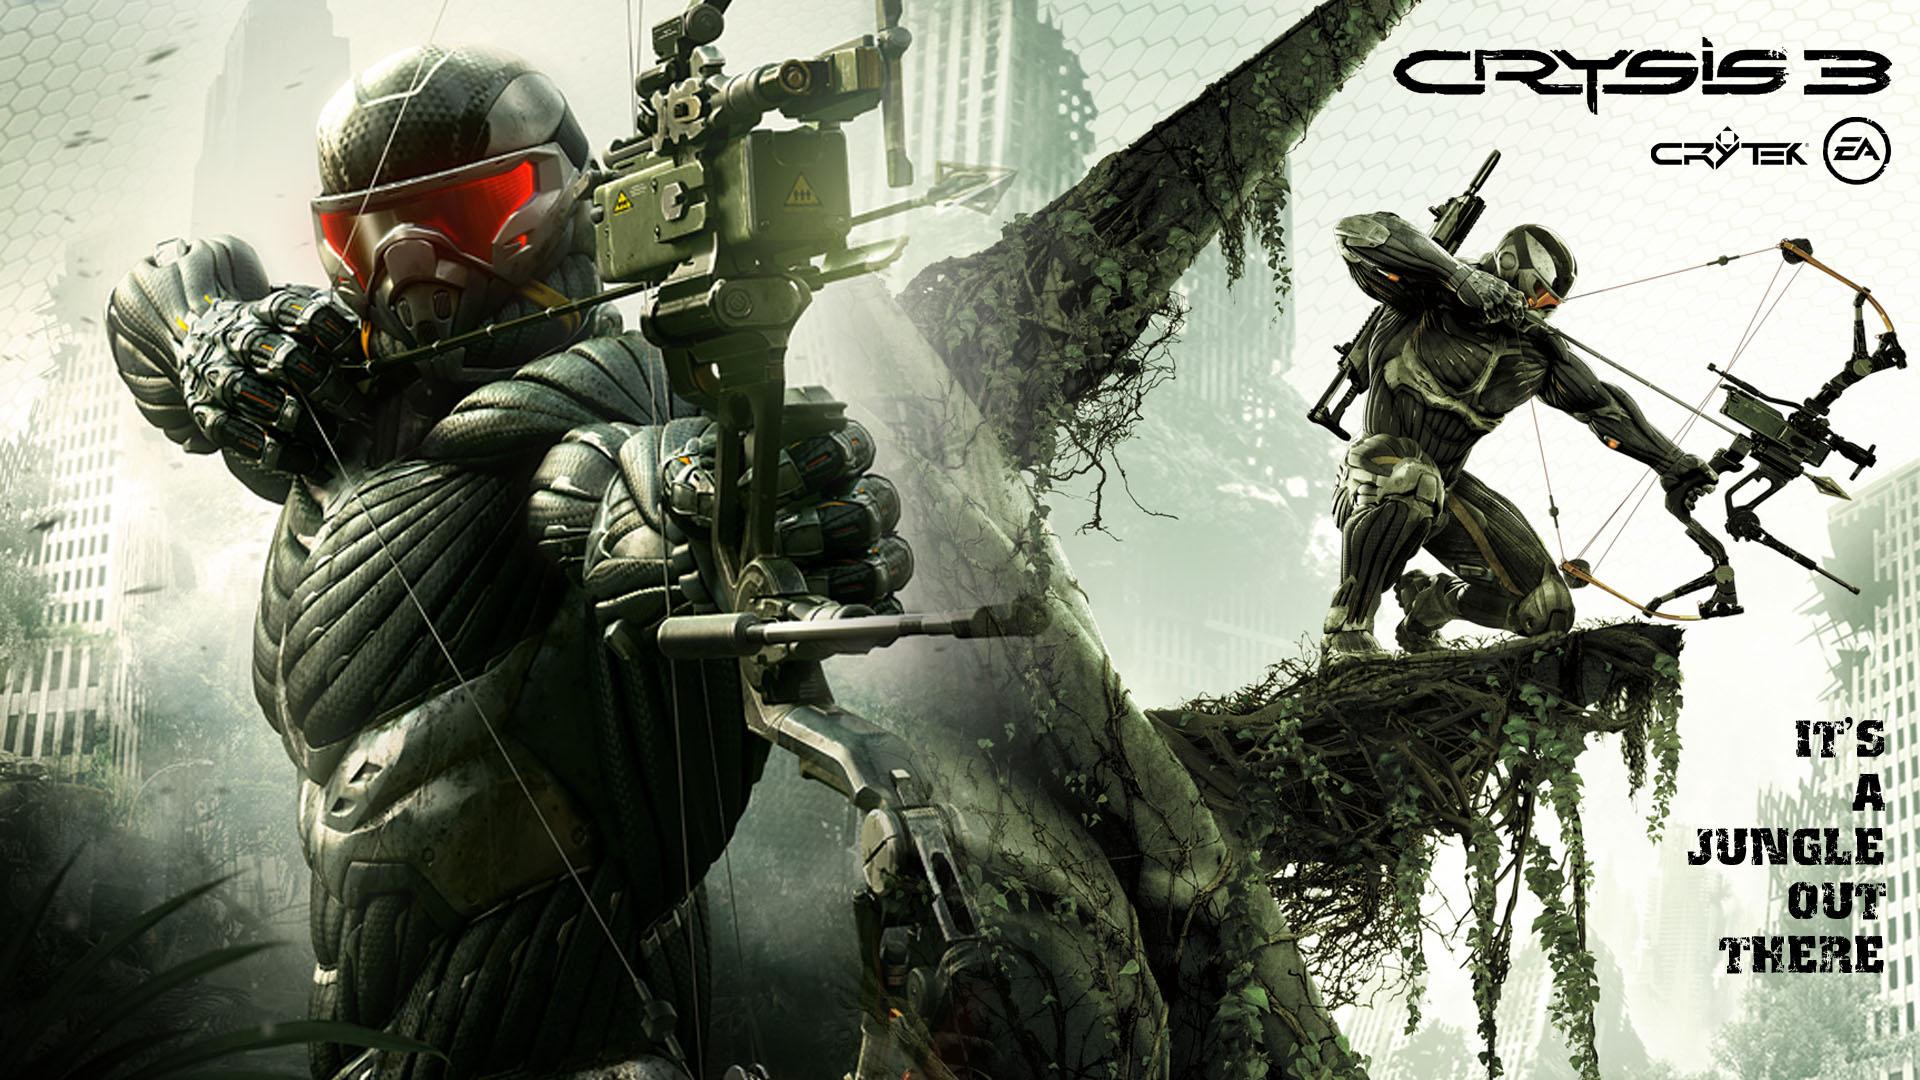 Crysis 3 2013 Video Game 4k Hd Desktop Wallpaper For 4k: Crysis 3 Computer Wallpapers, Desktop Backgrounds